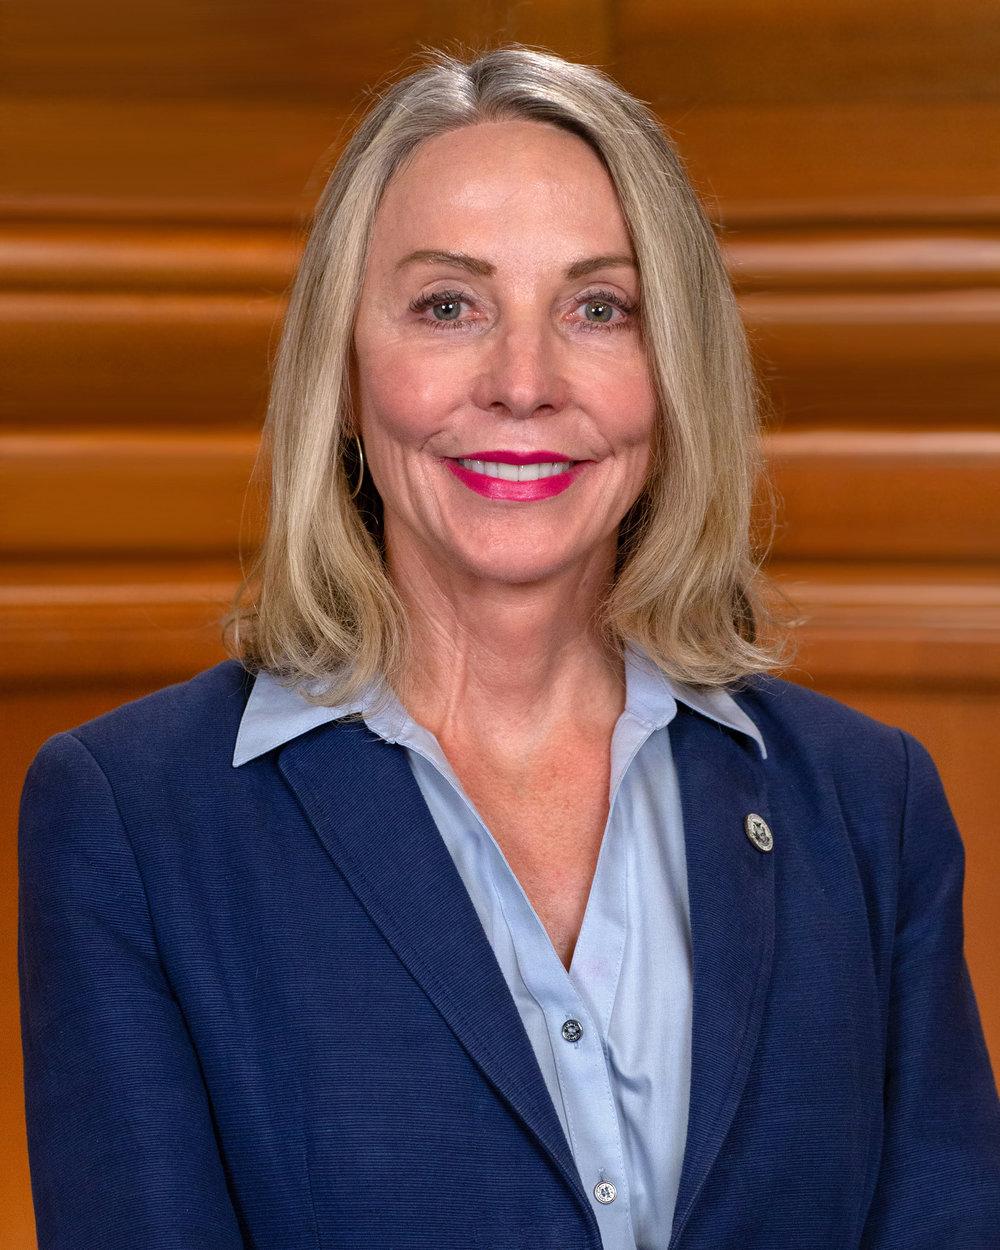 District 5 Supervisor, Vallie Brown